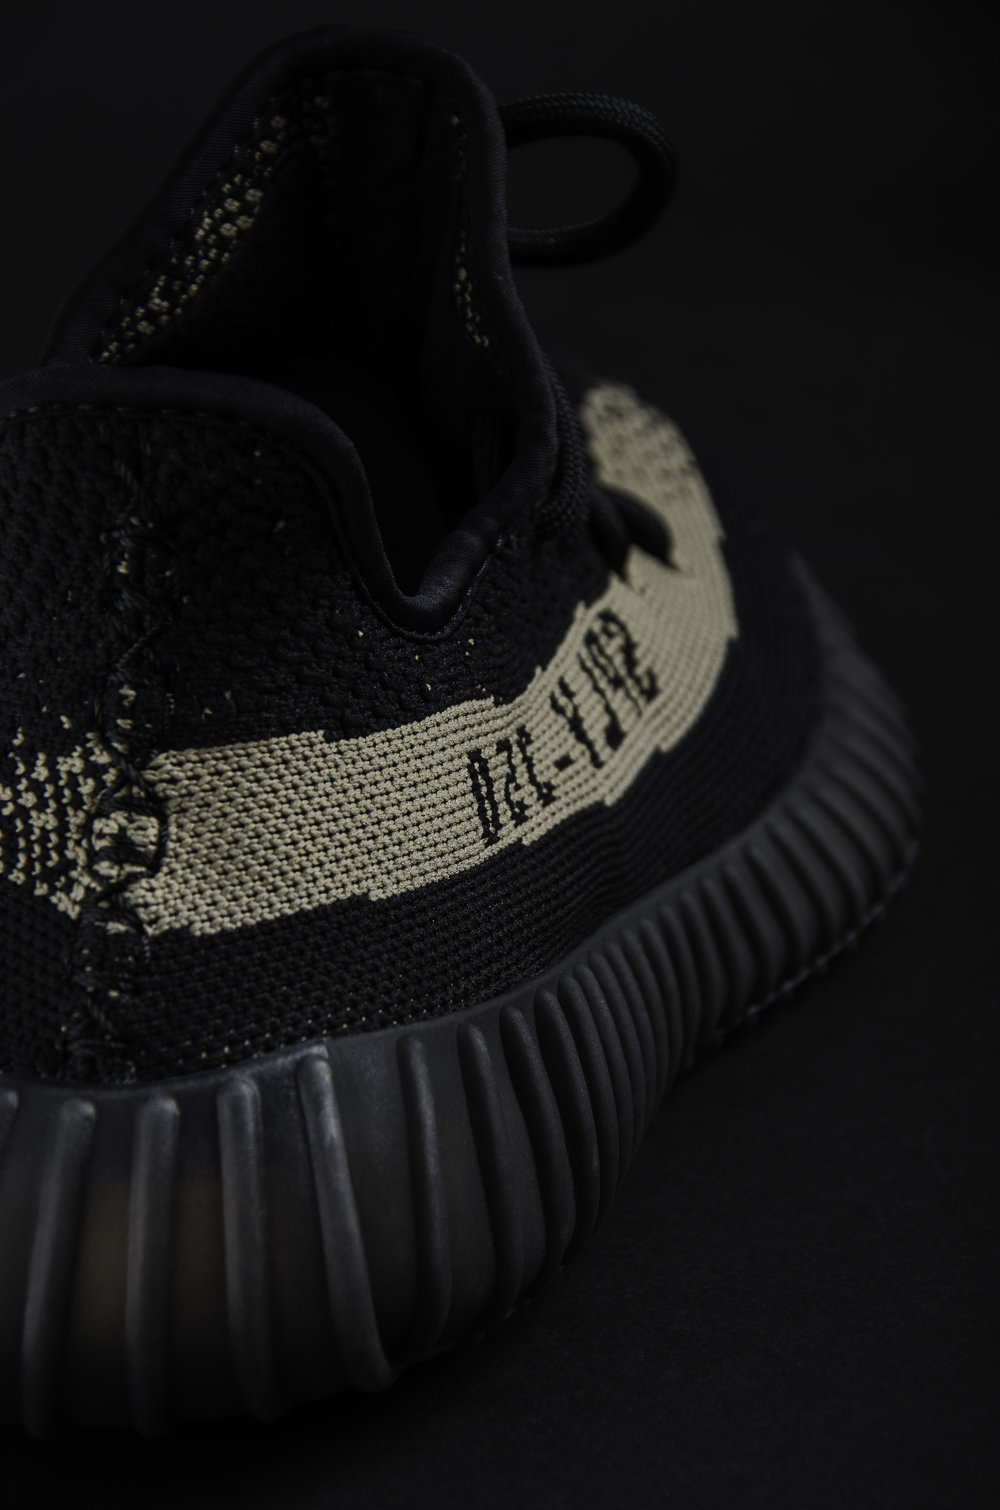 Adidas Yeezy 350 v2 Boost SPLY Kanye West Black Olive